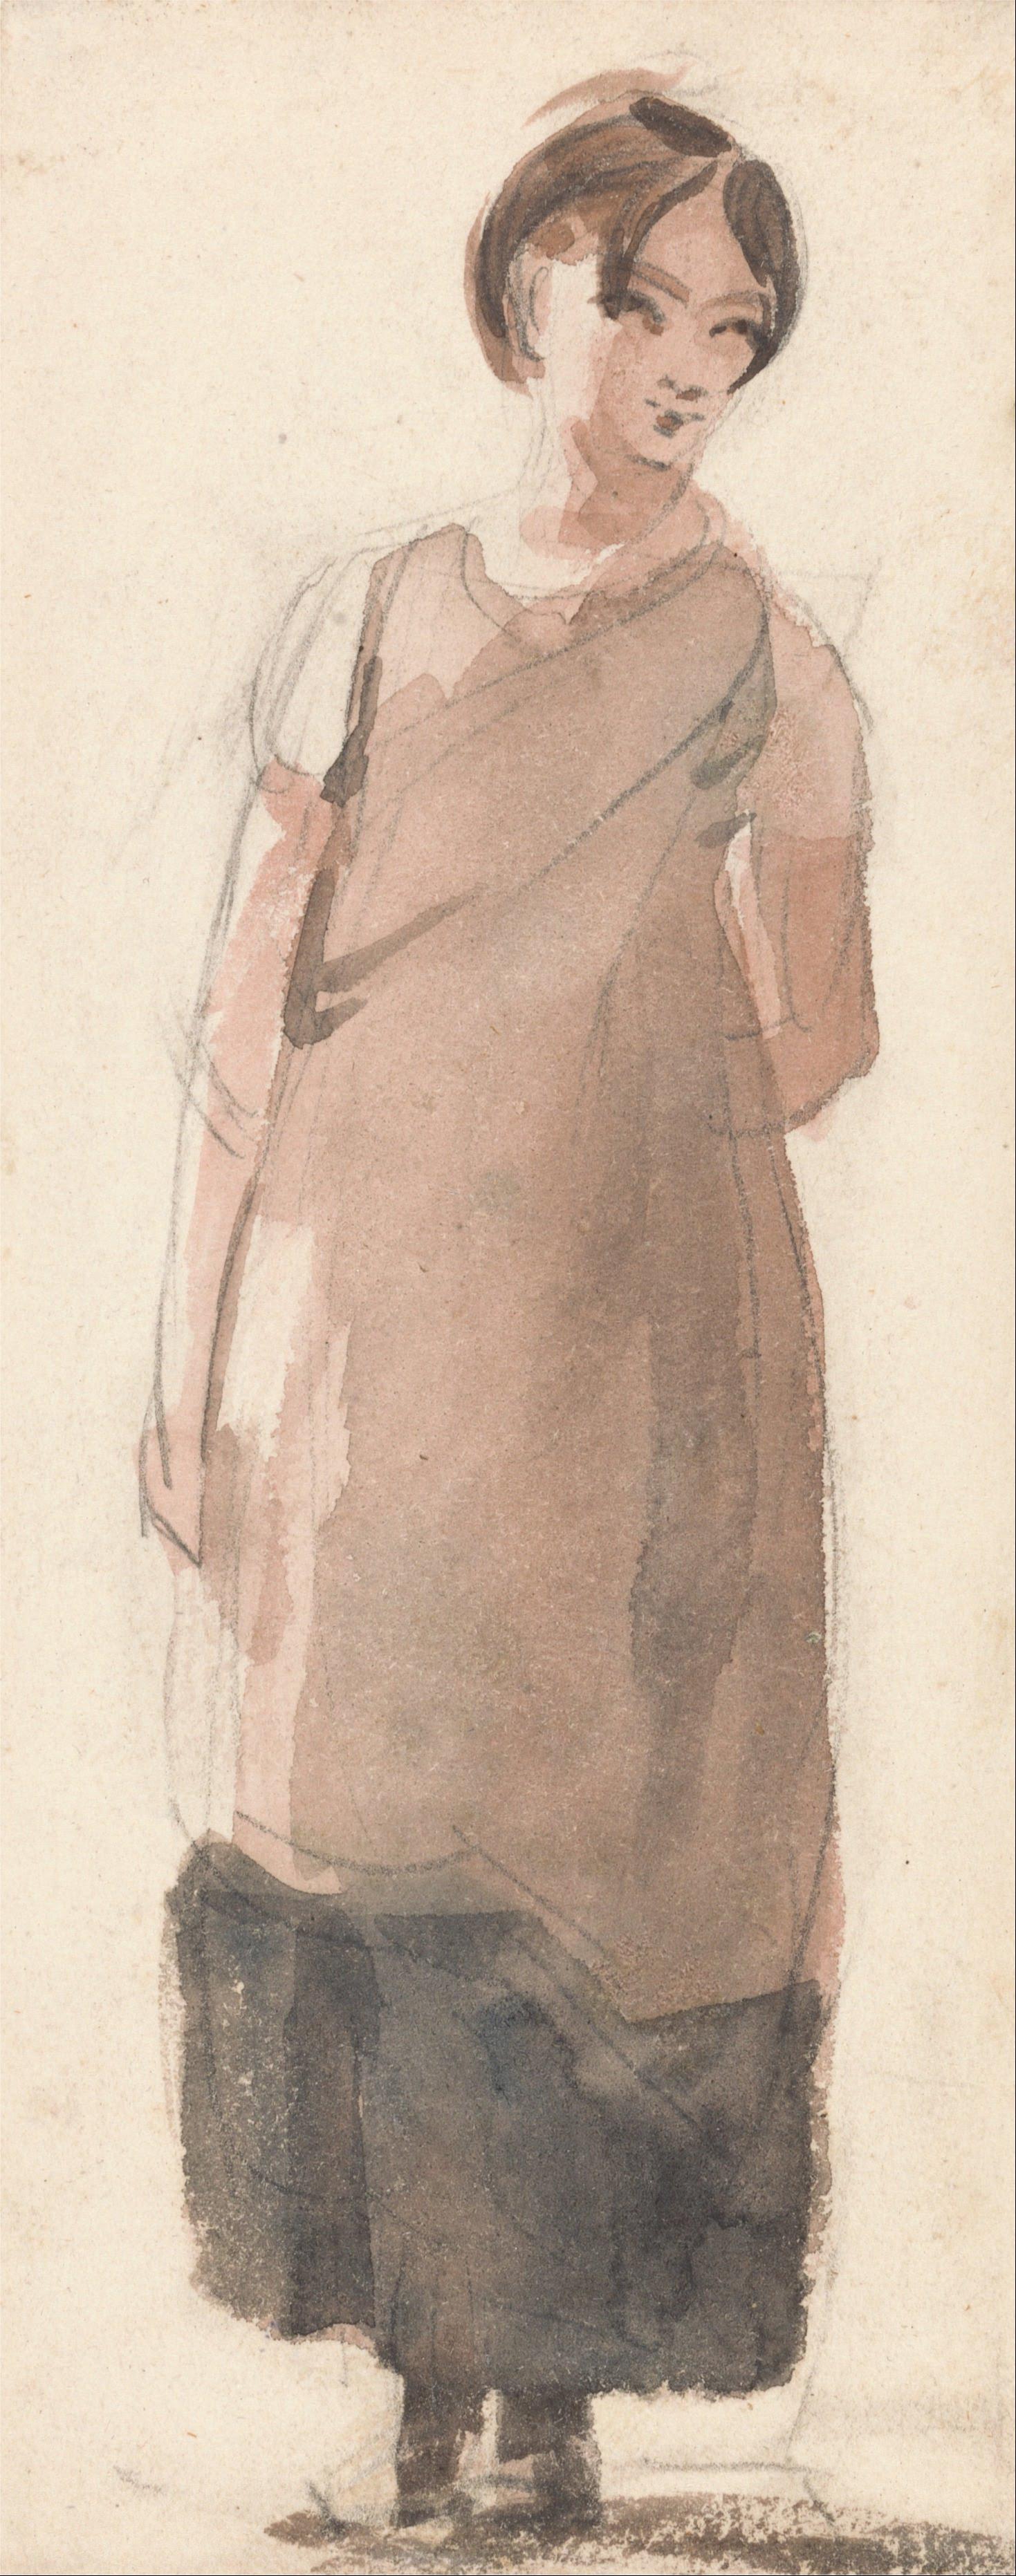 John Constable. Portrait of a peasant girl